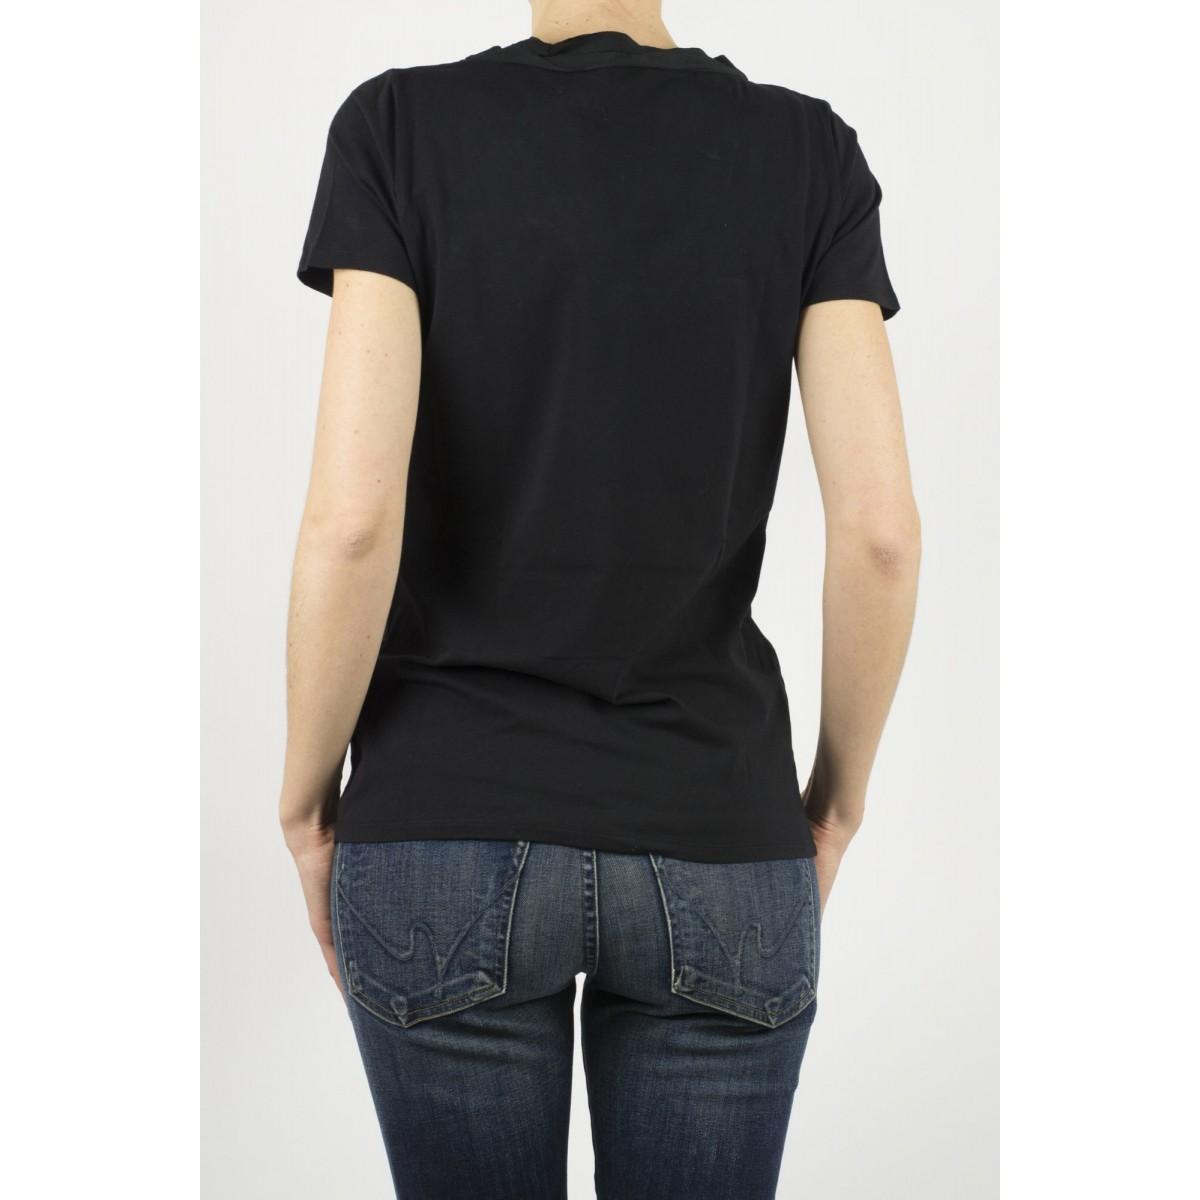 T-Shirt Woman Kangra - 6516/75 13 T-Shirt Woman